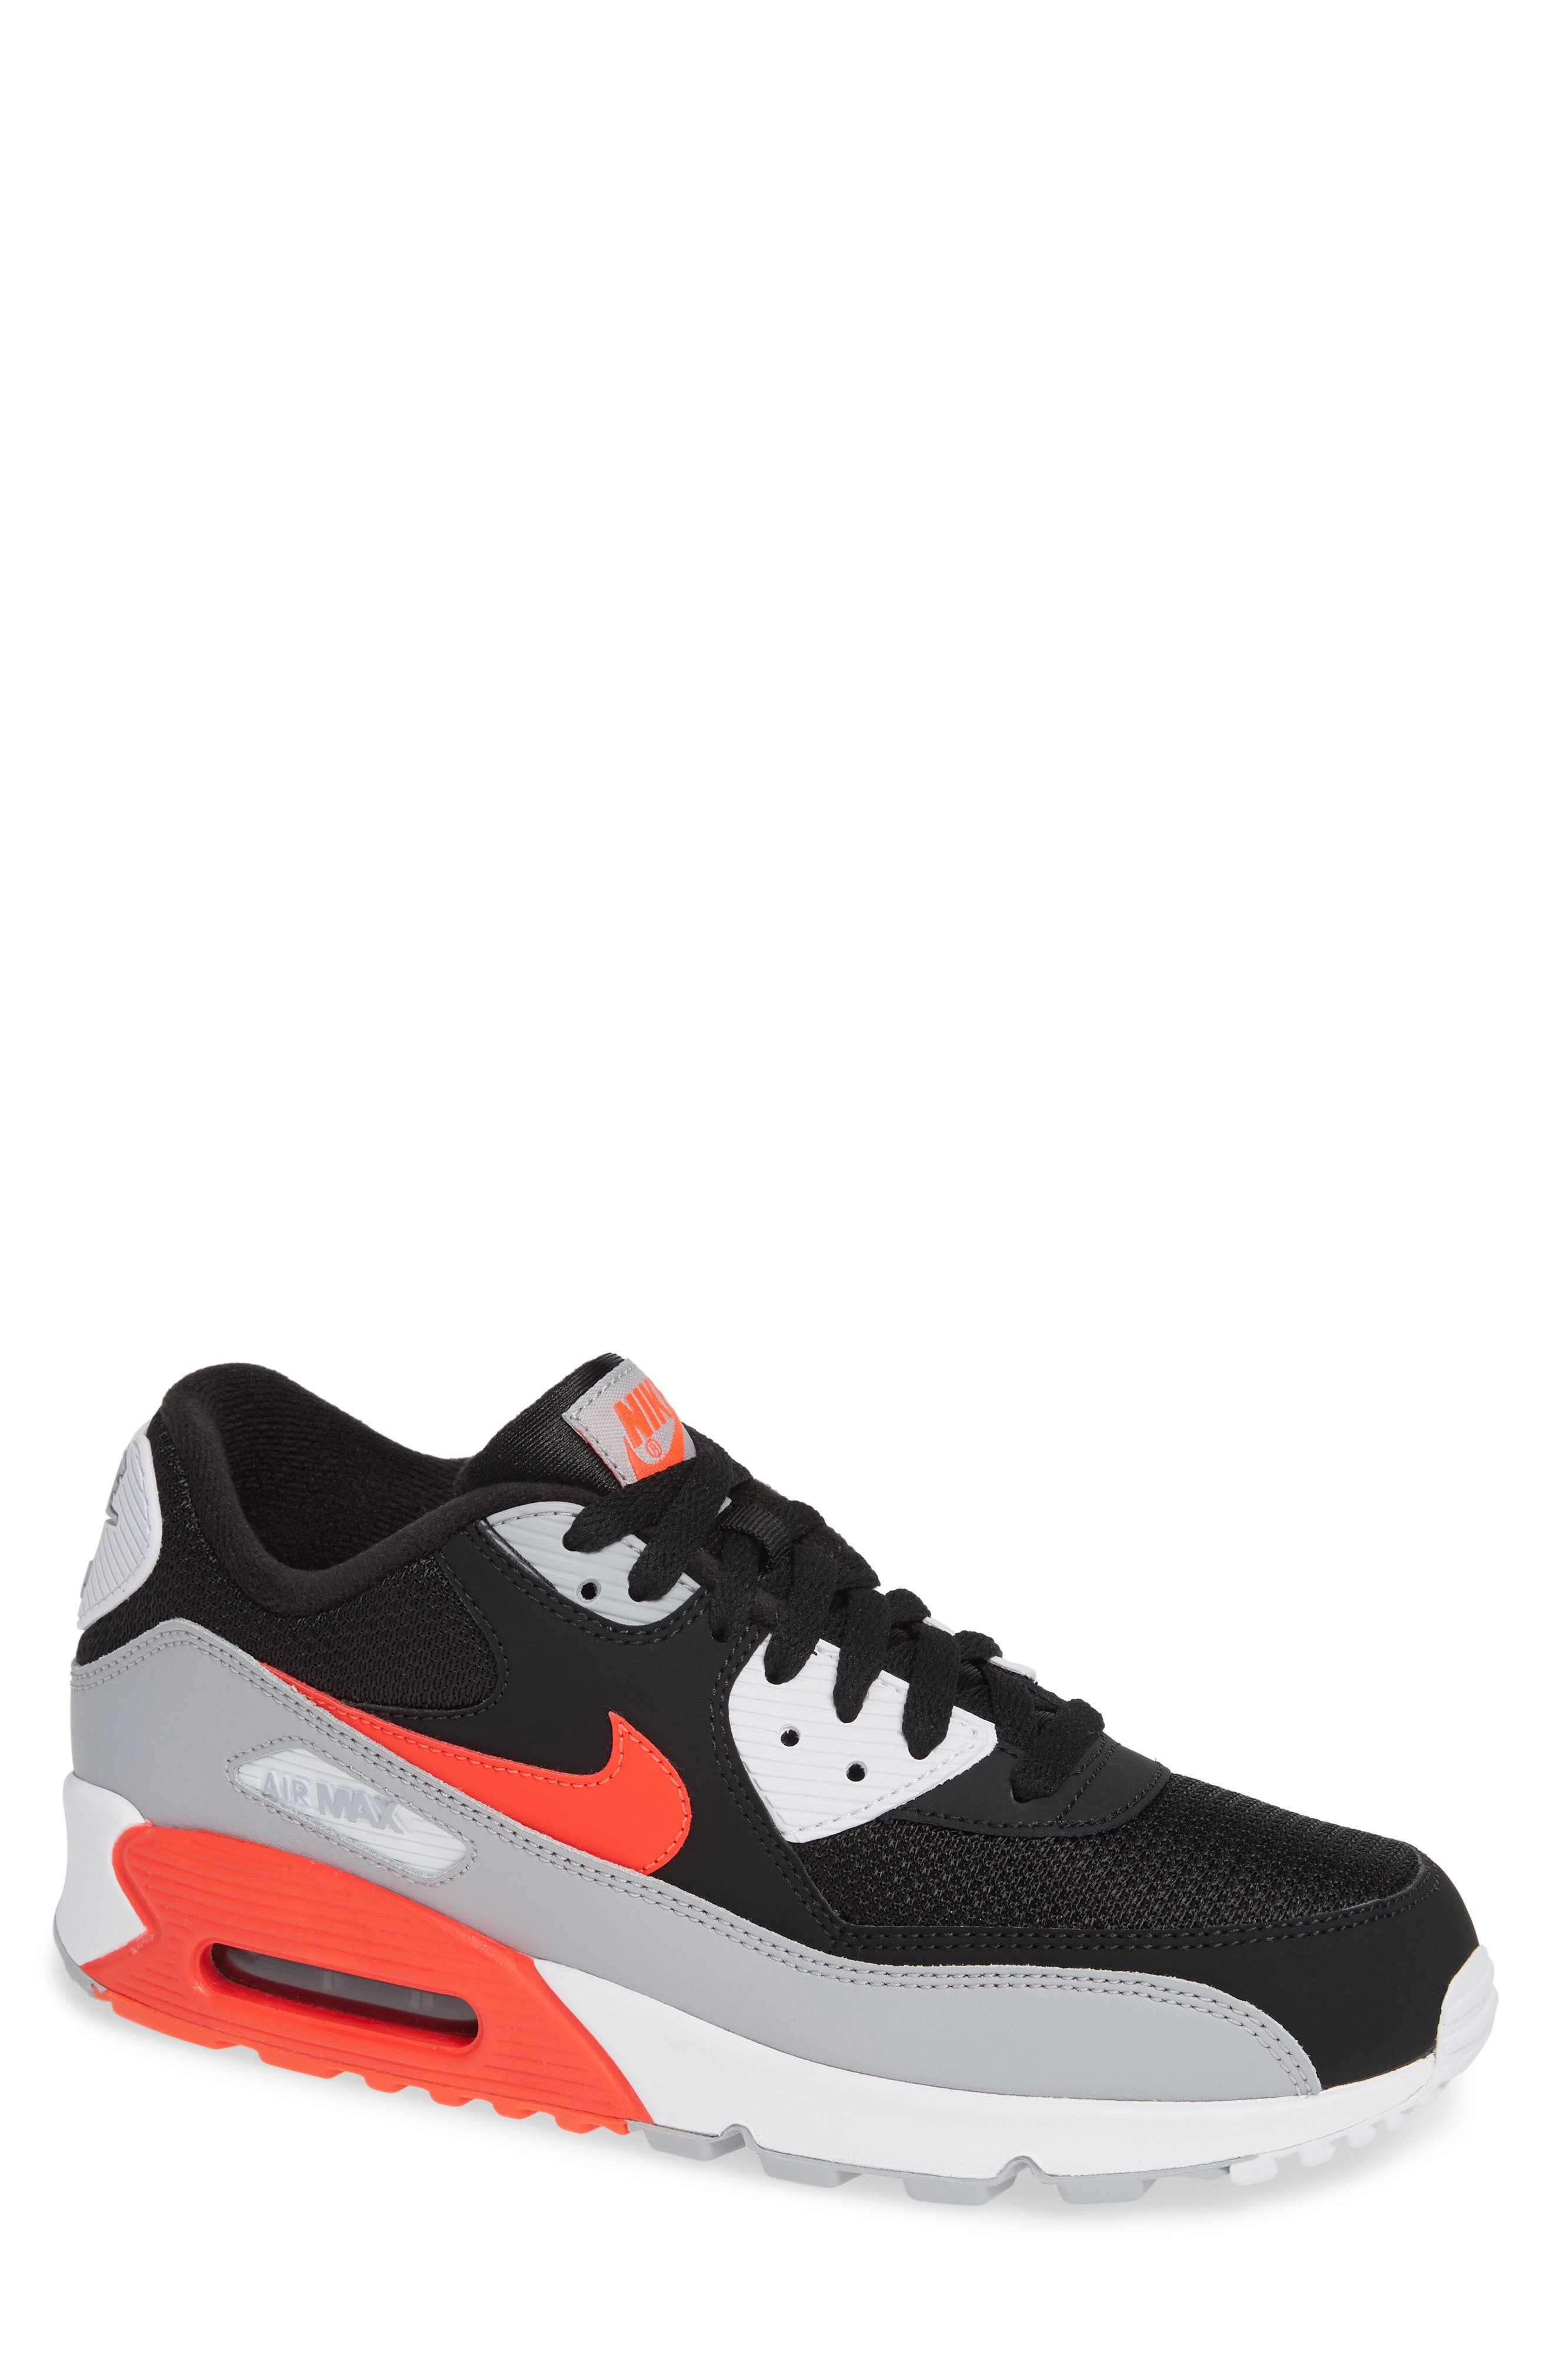 Air Max 90 Essential Sneaker,                         Main,                         color, WOLF GREY/ CRIMSON/ BLACK